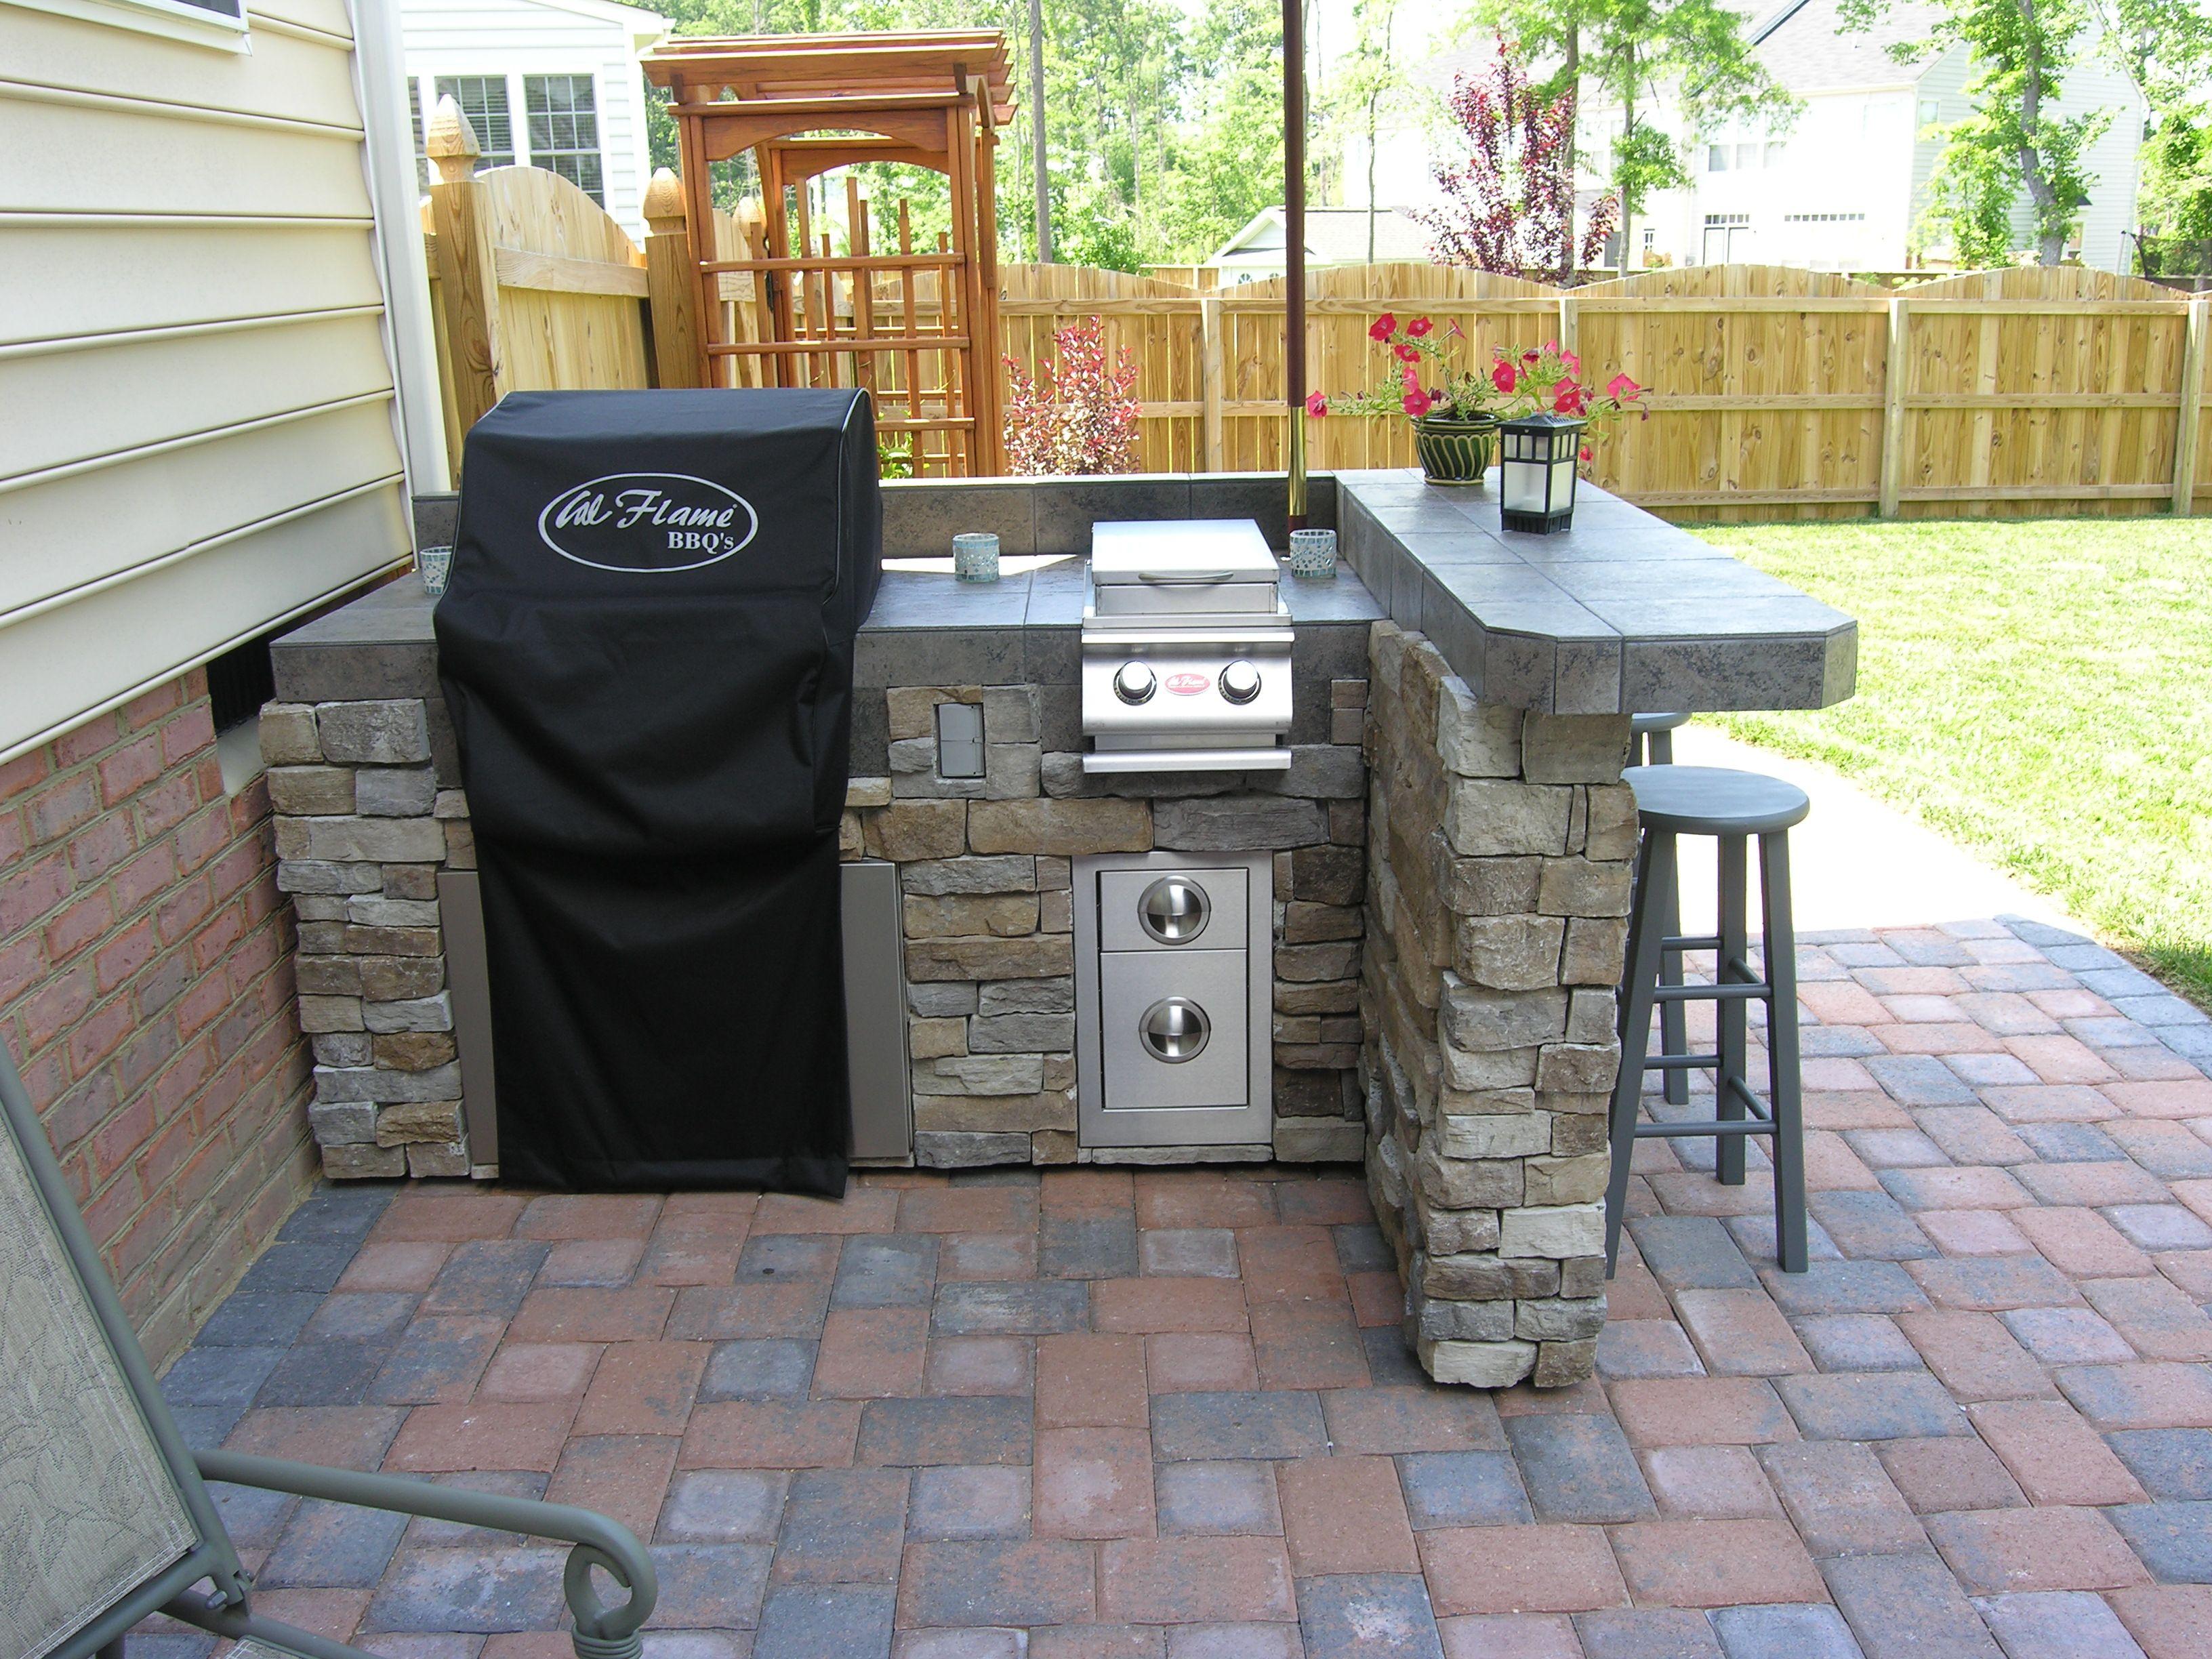 simple outdoor kitchen outdoor kitchen ideas 17 best ideas about Simple Outdoor Kitchen on Pinterest Diy outdoor kitchen Outdoor grilling and Grill station